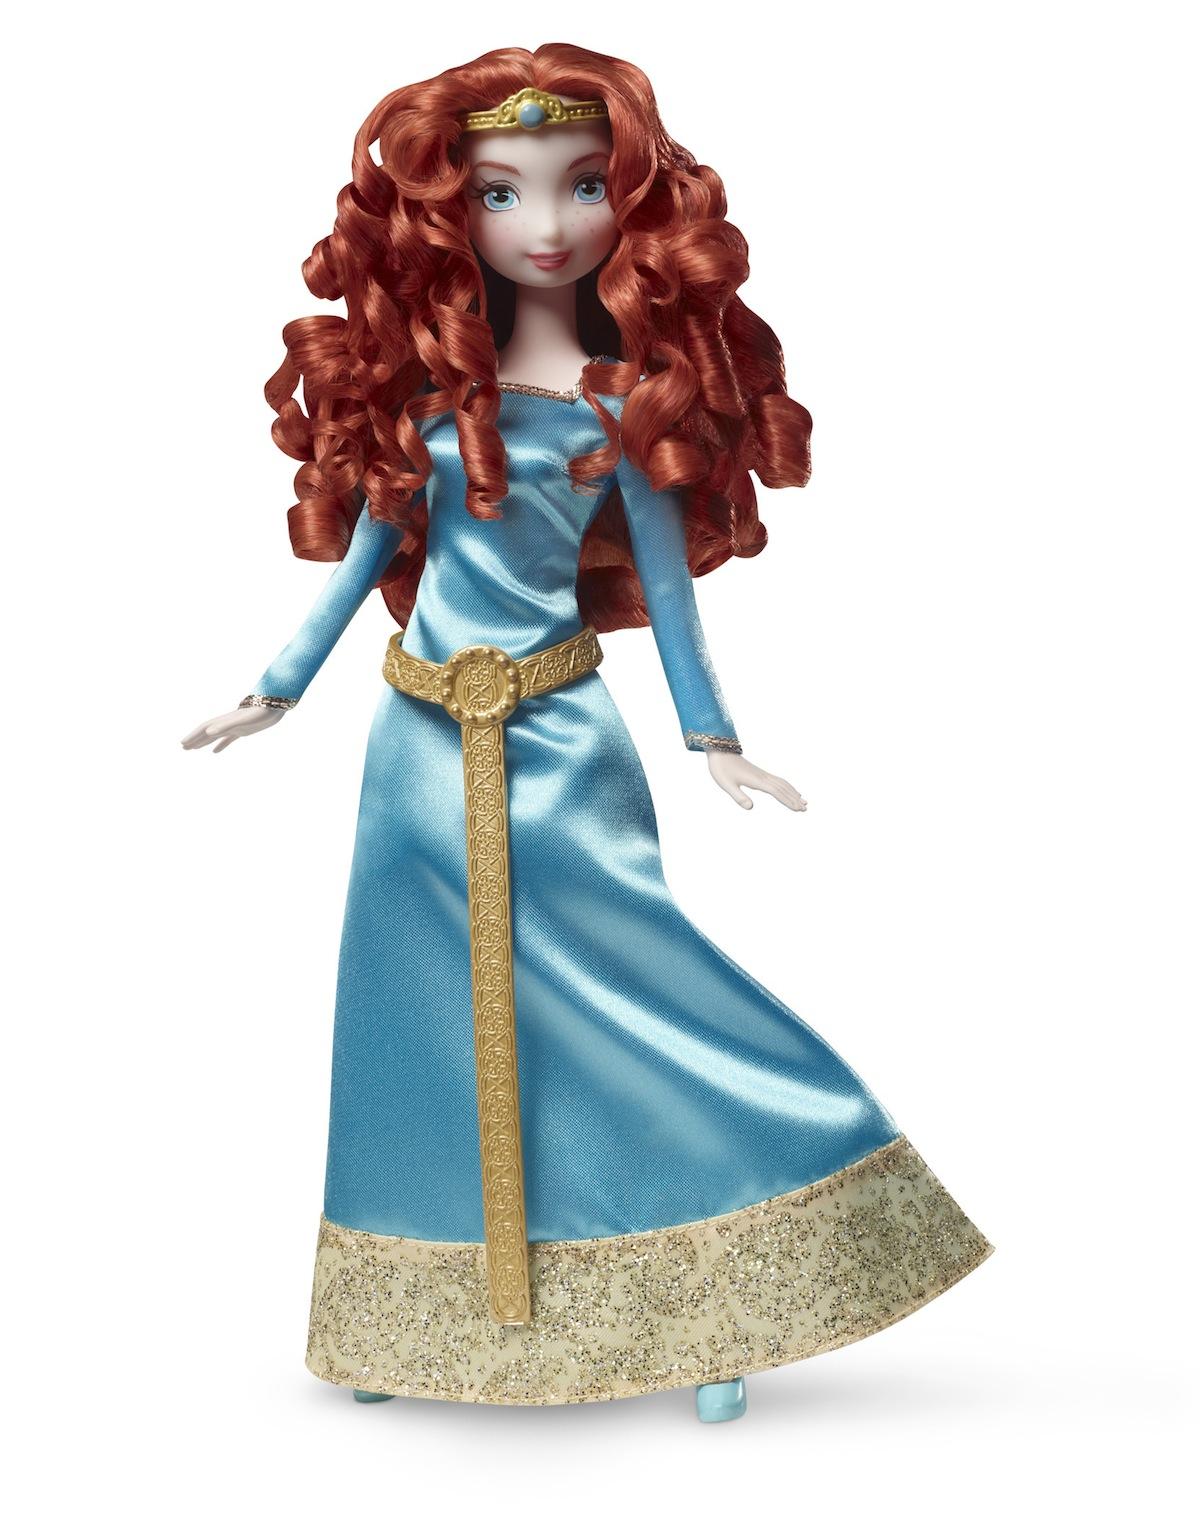 Disney Princess Toys : Toy fair 'brave merchandise